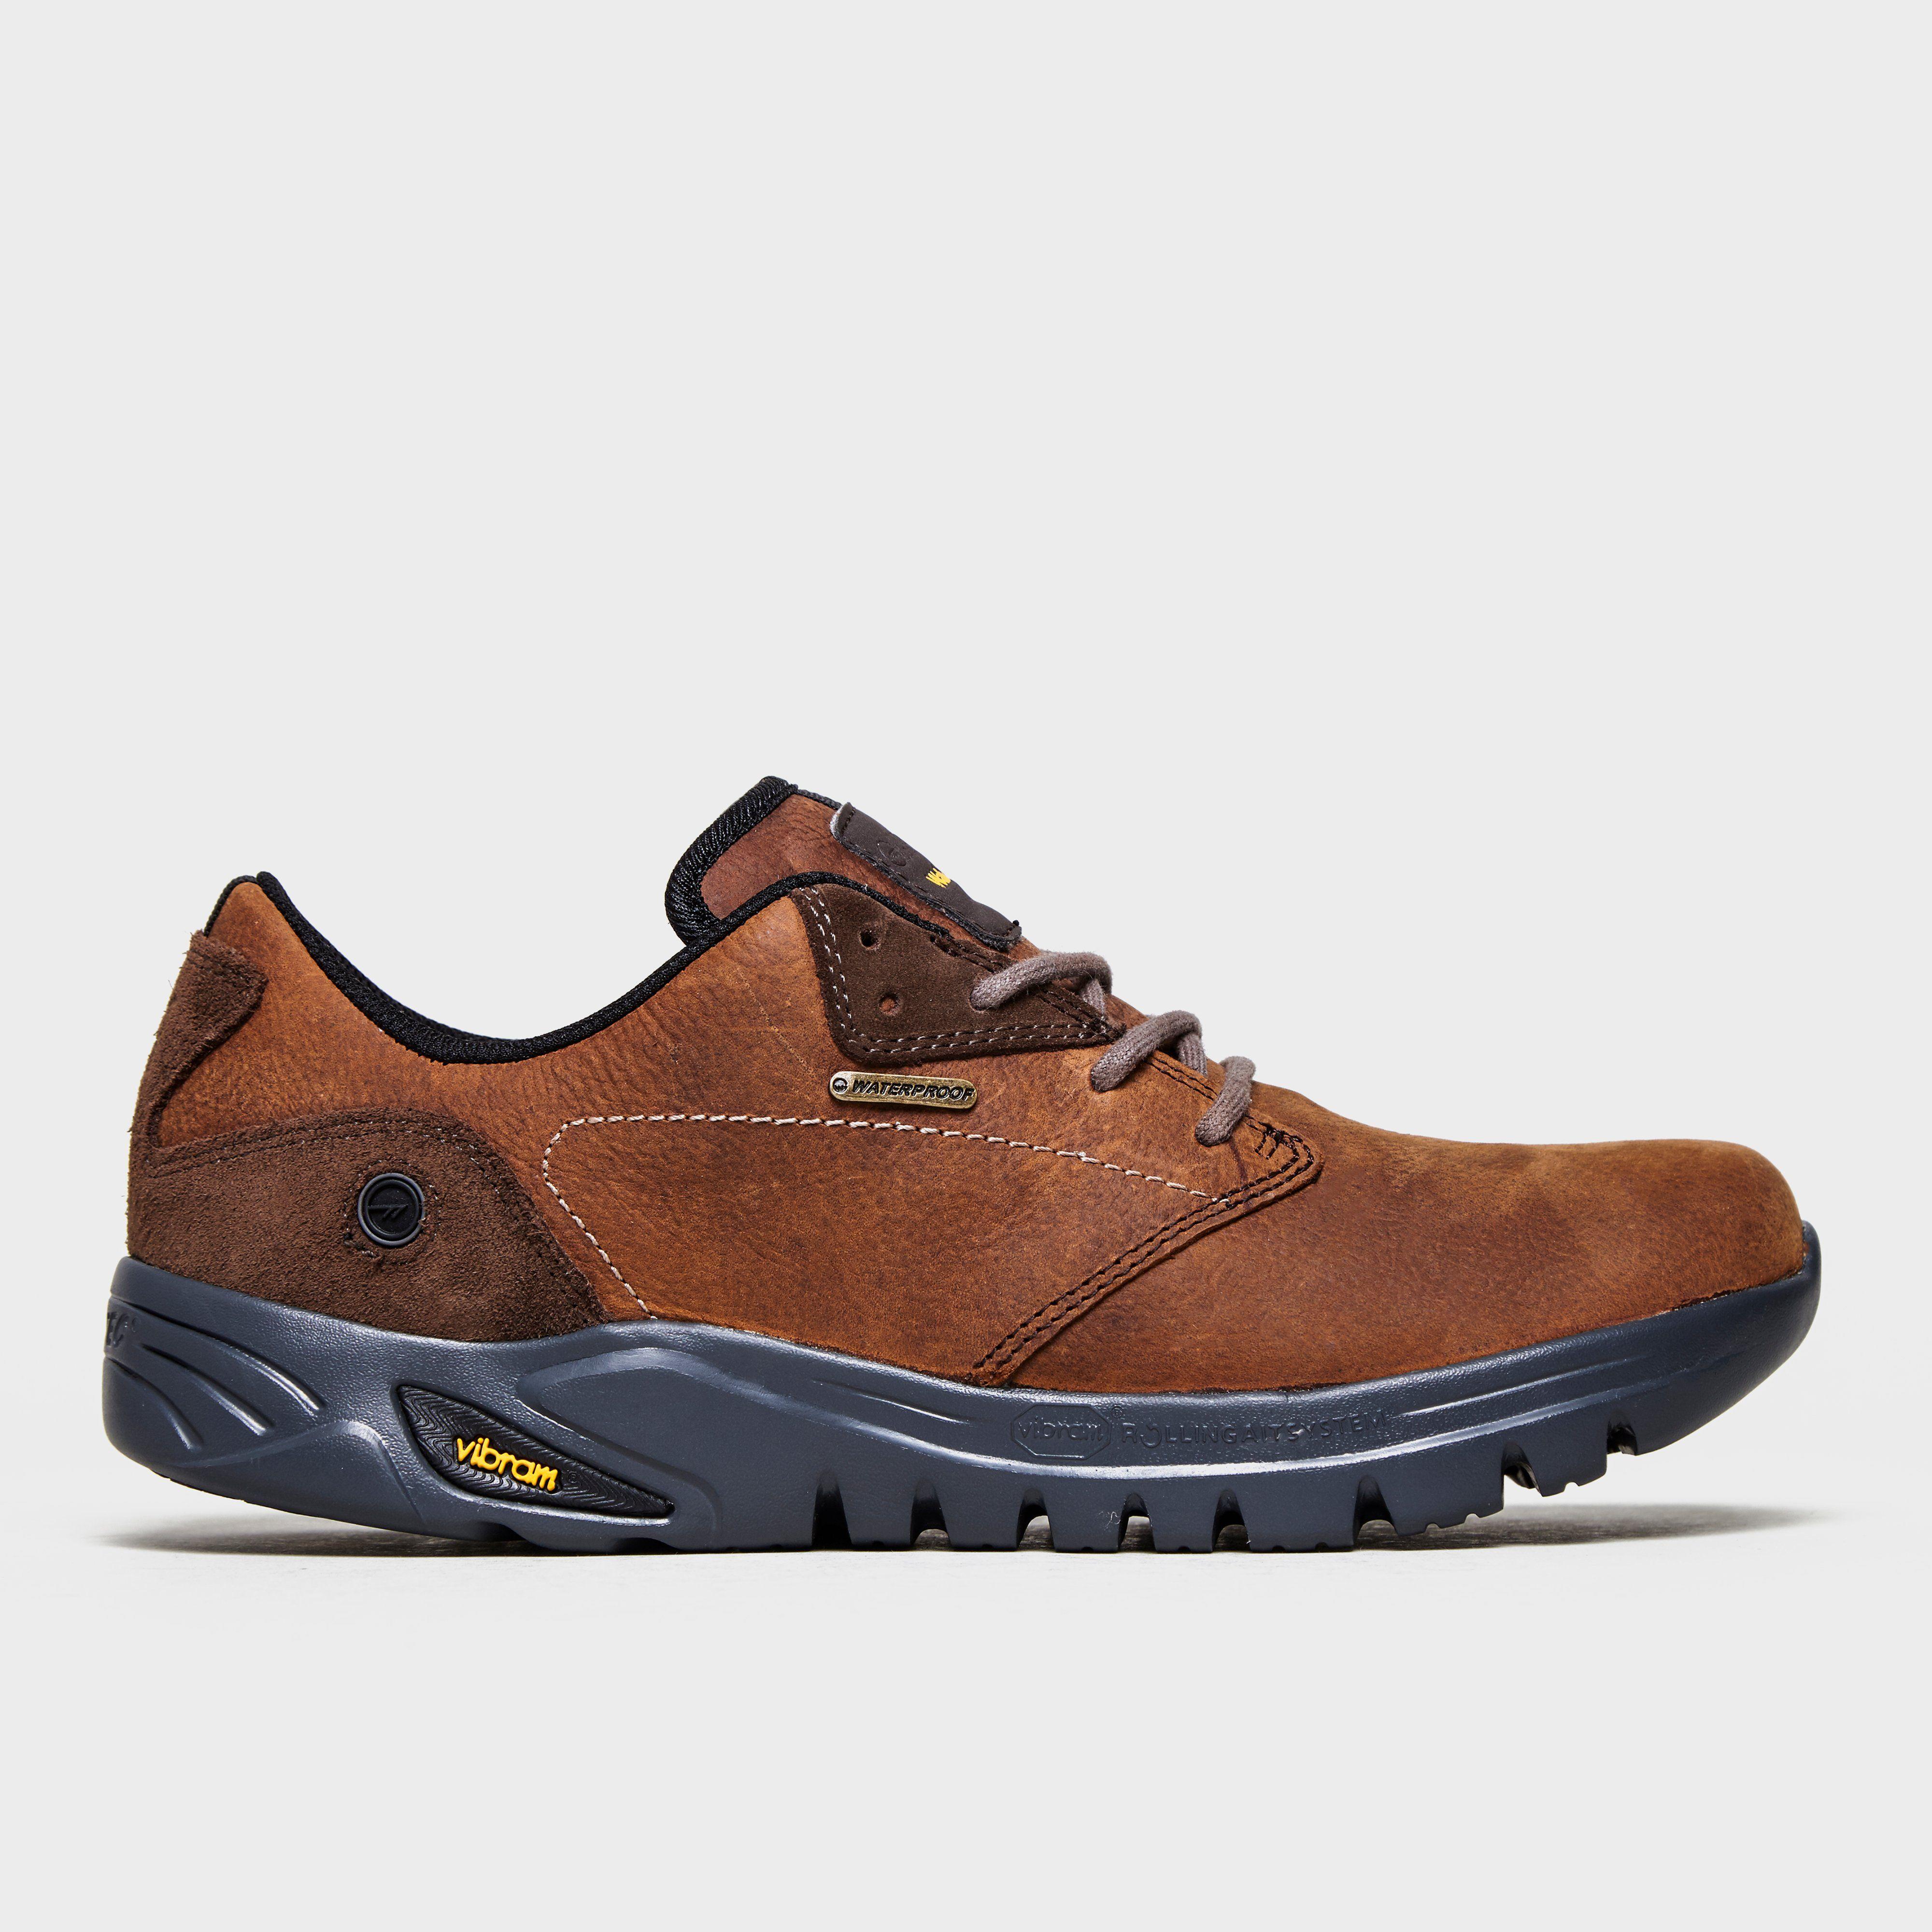 HI TEC Men's V Lite Walk.Lite Witton Walking Shoe